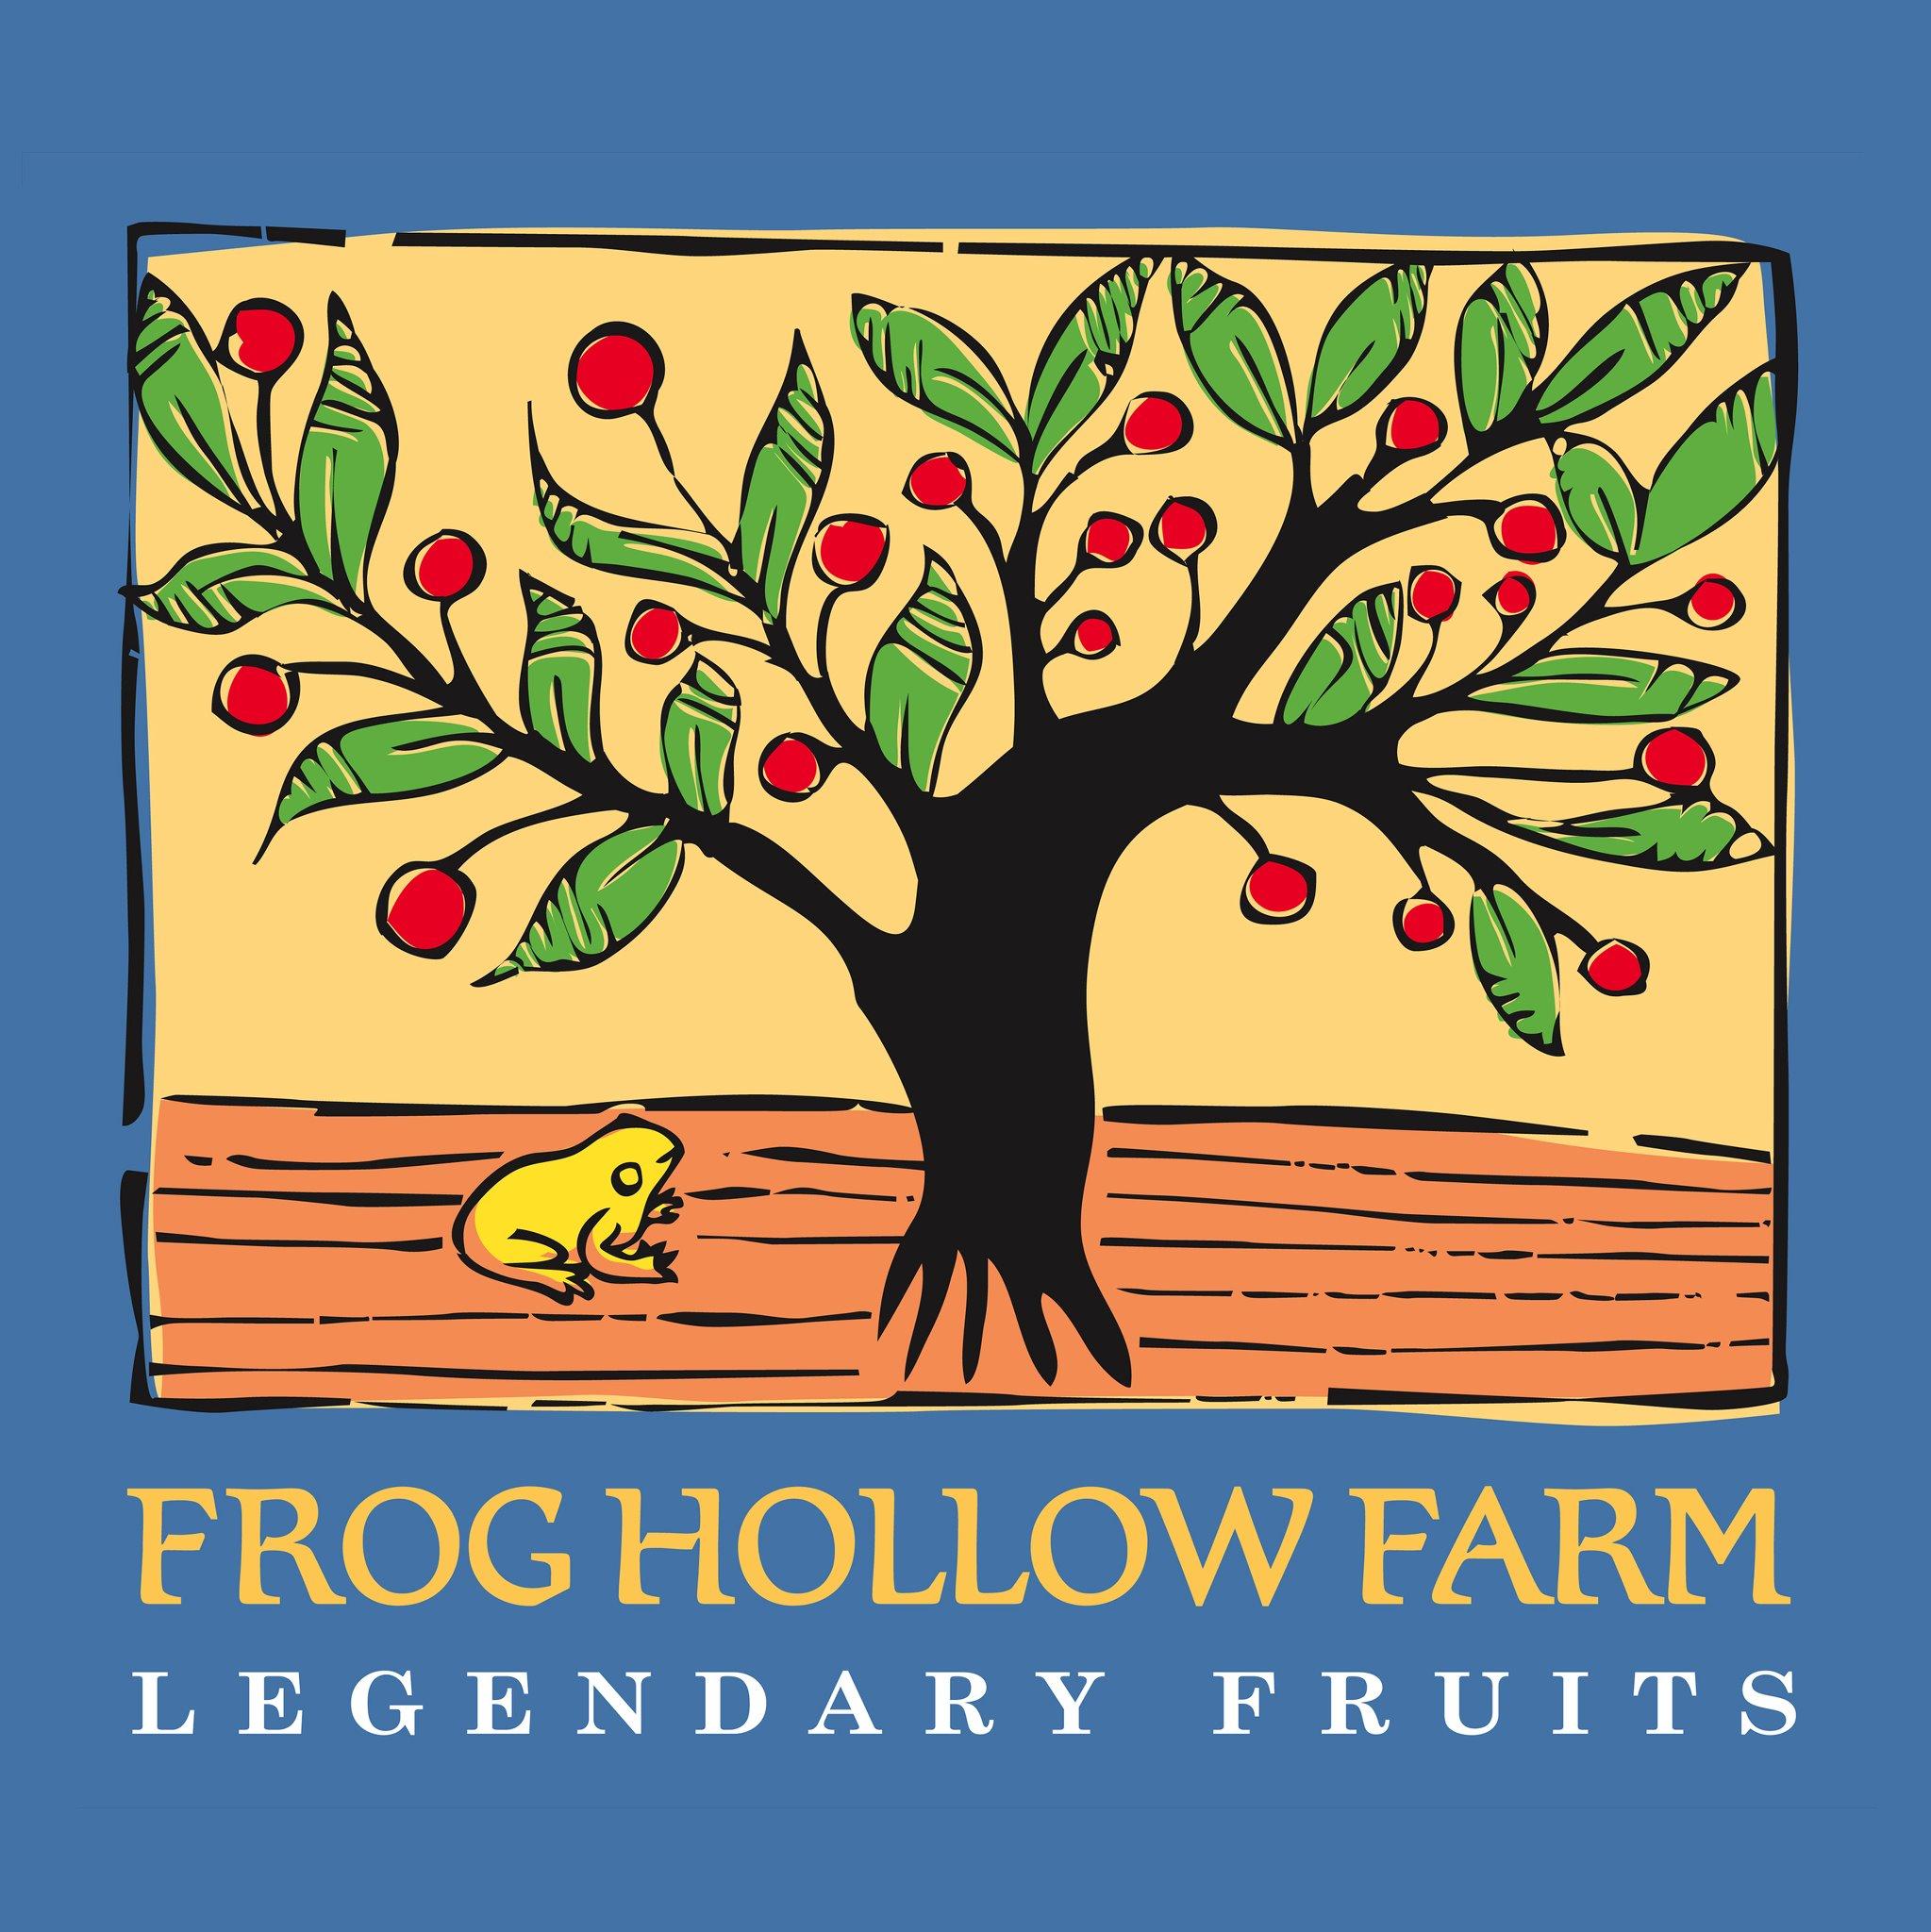 frog hollow farm logo